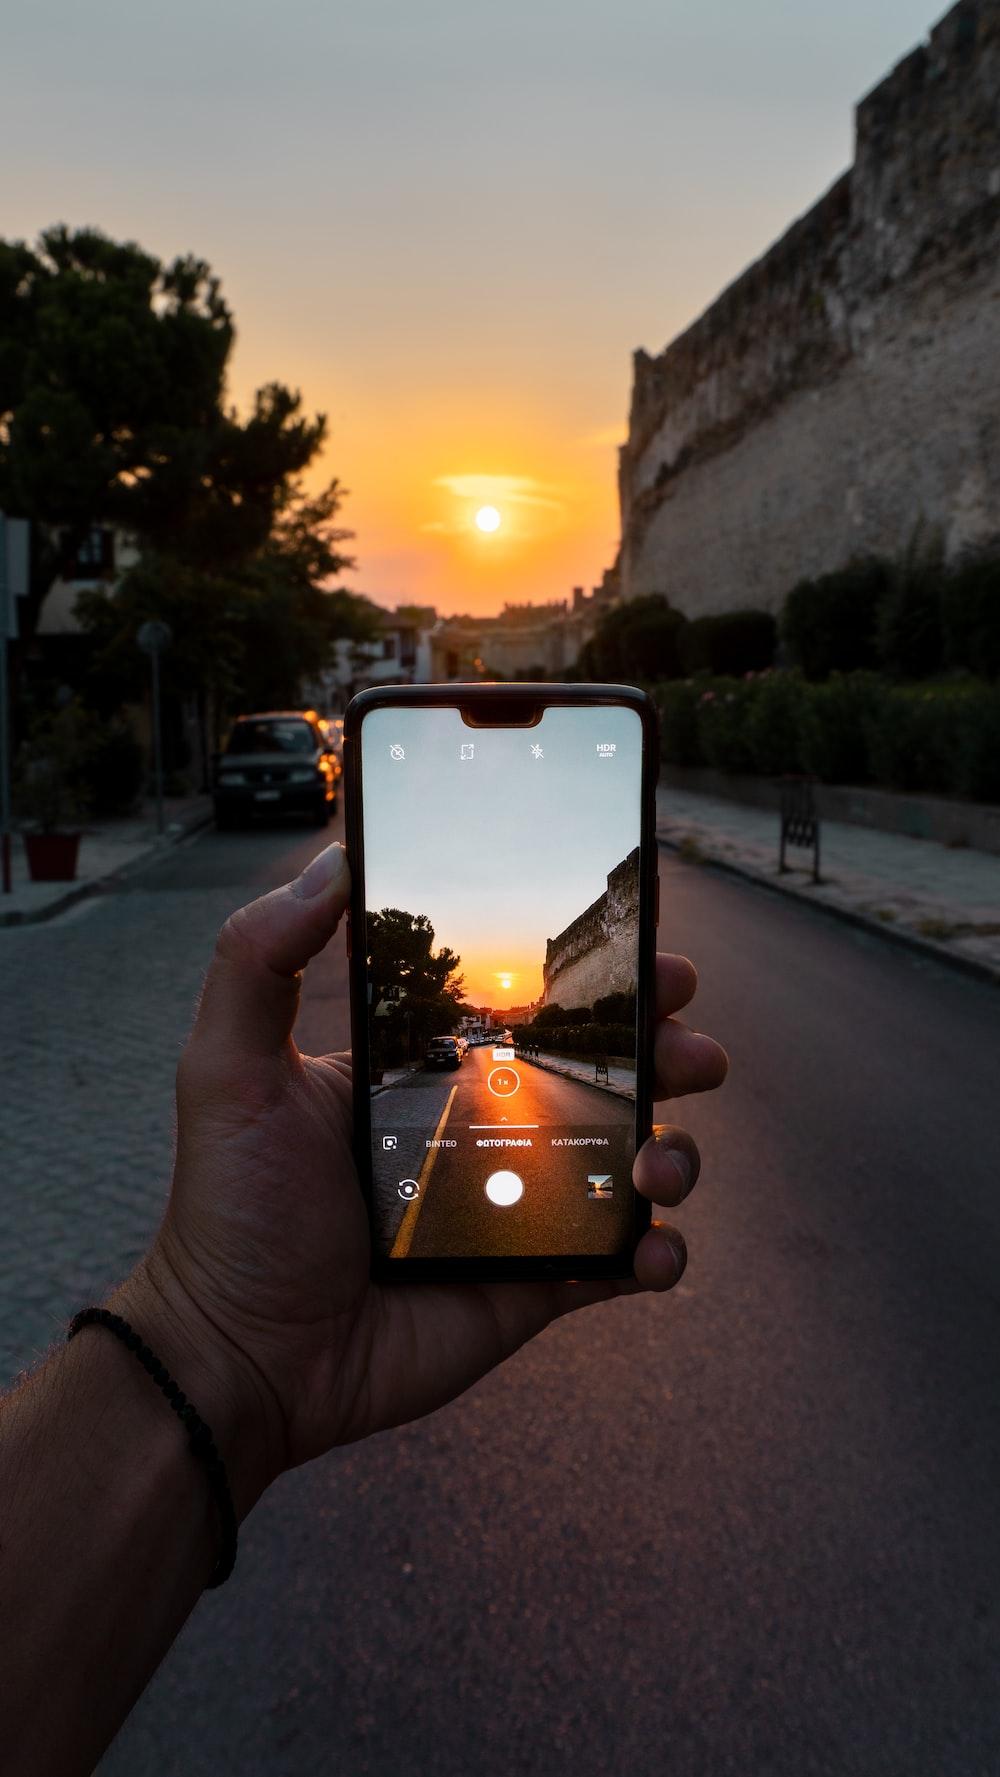 black smartphone close-up photography